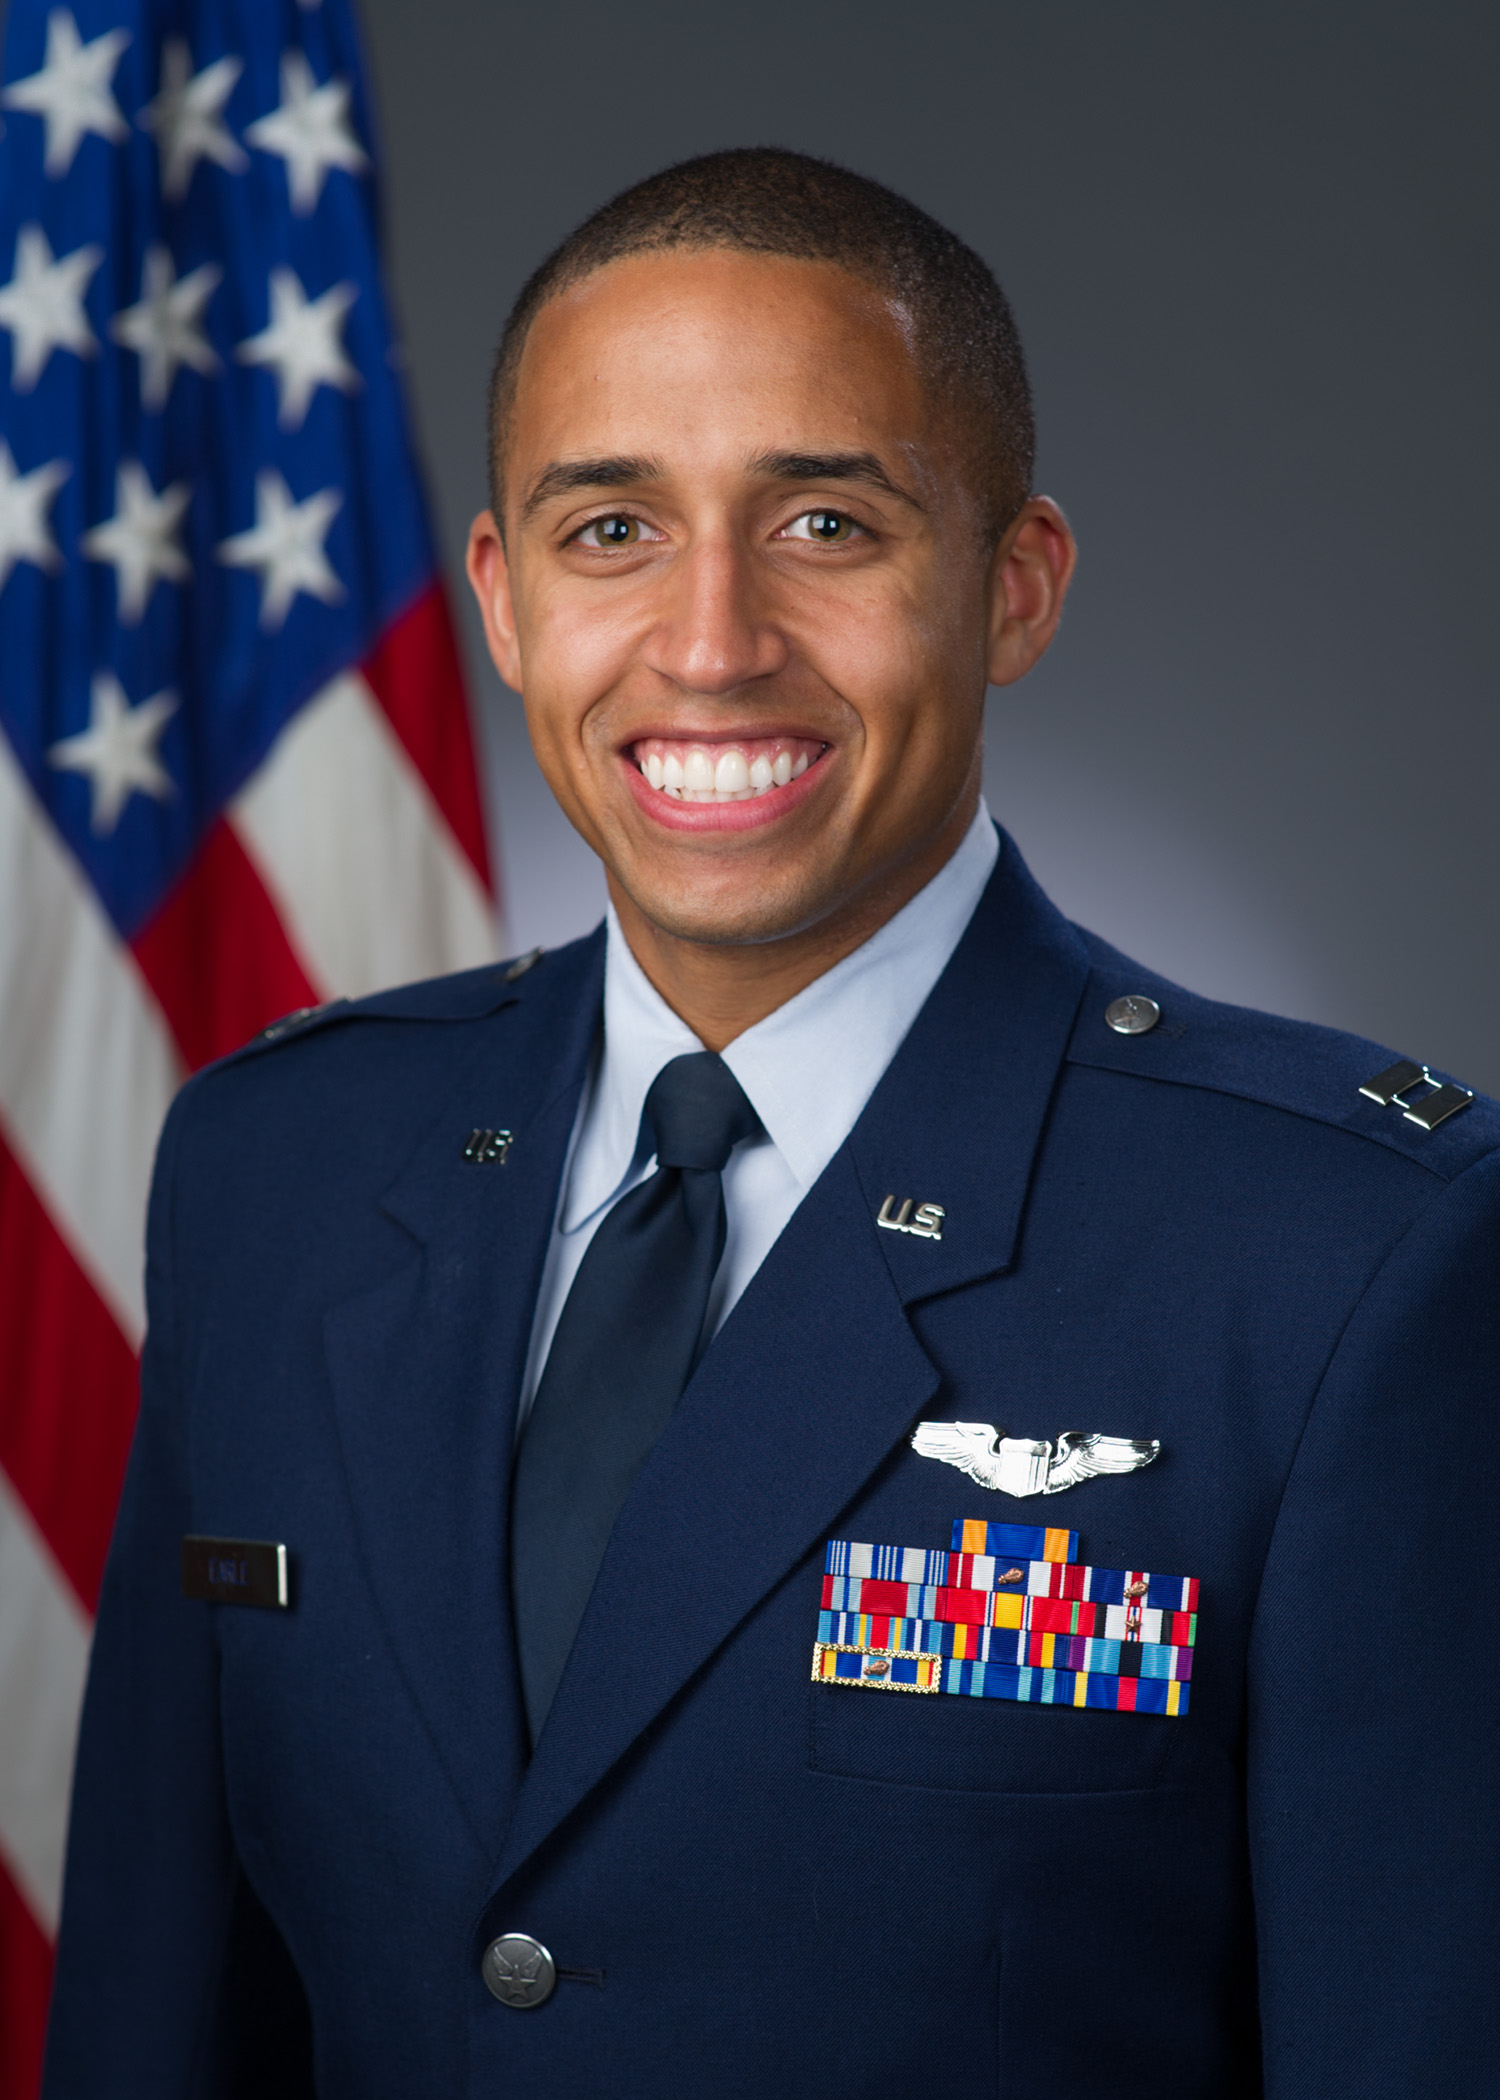 Travis Air Force Base, California Base Multimedia Center (707) 424-5584 DSN: 837-5584